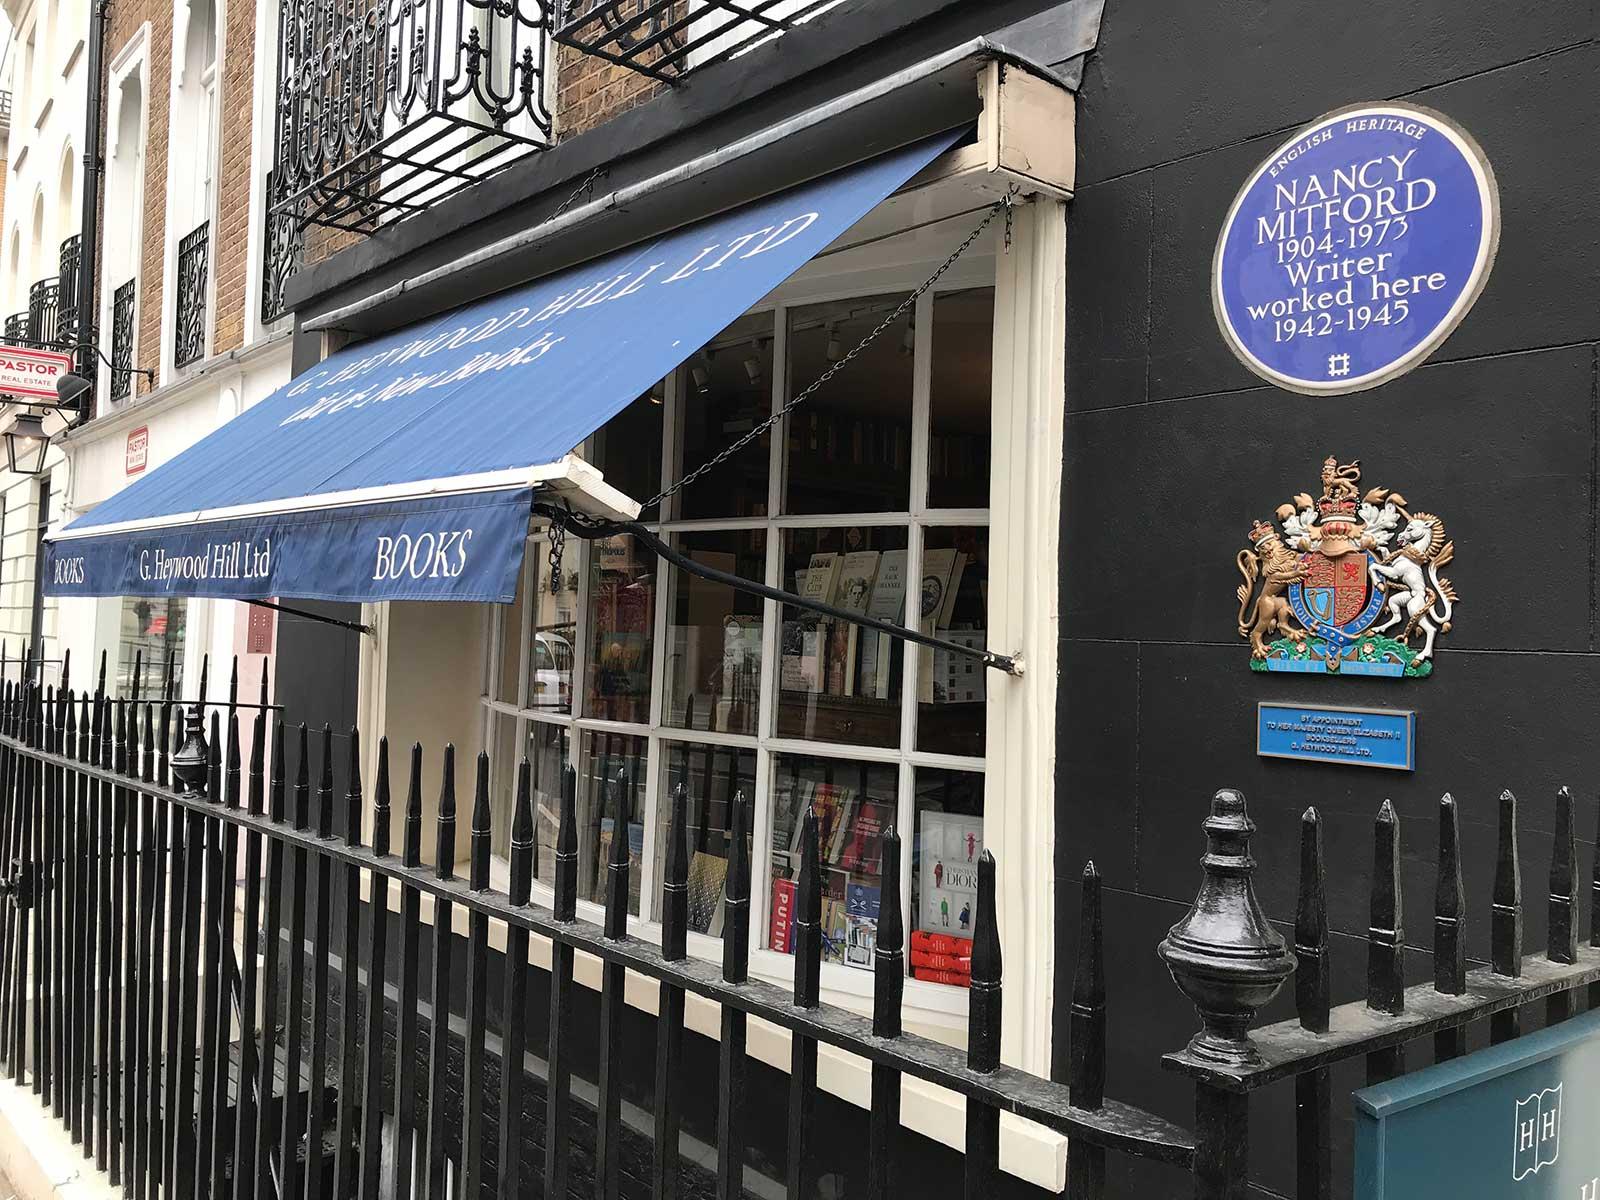 Heywood Hill Bookshop